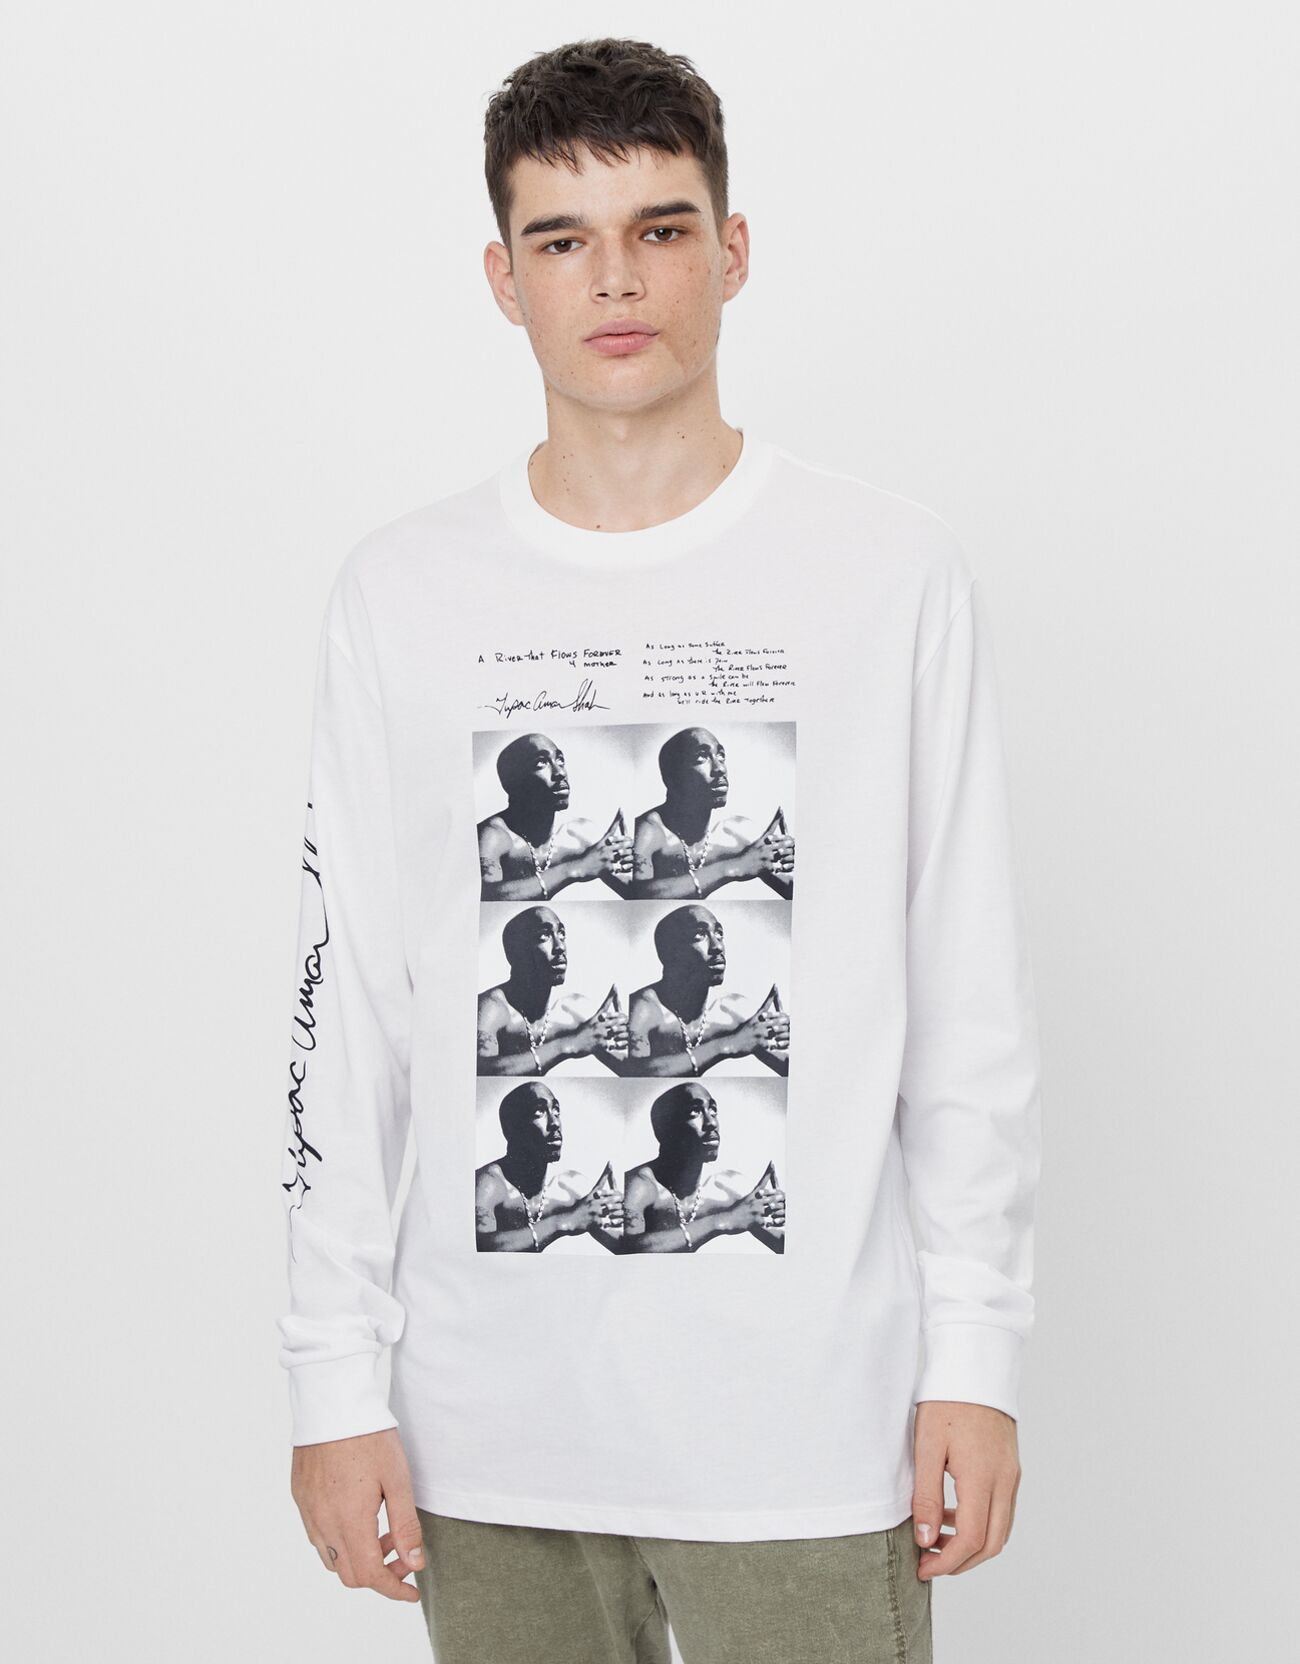 Camiseta de manga larga de Tupac